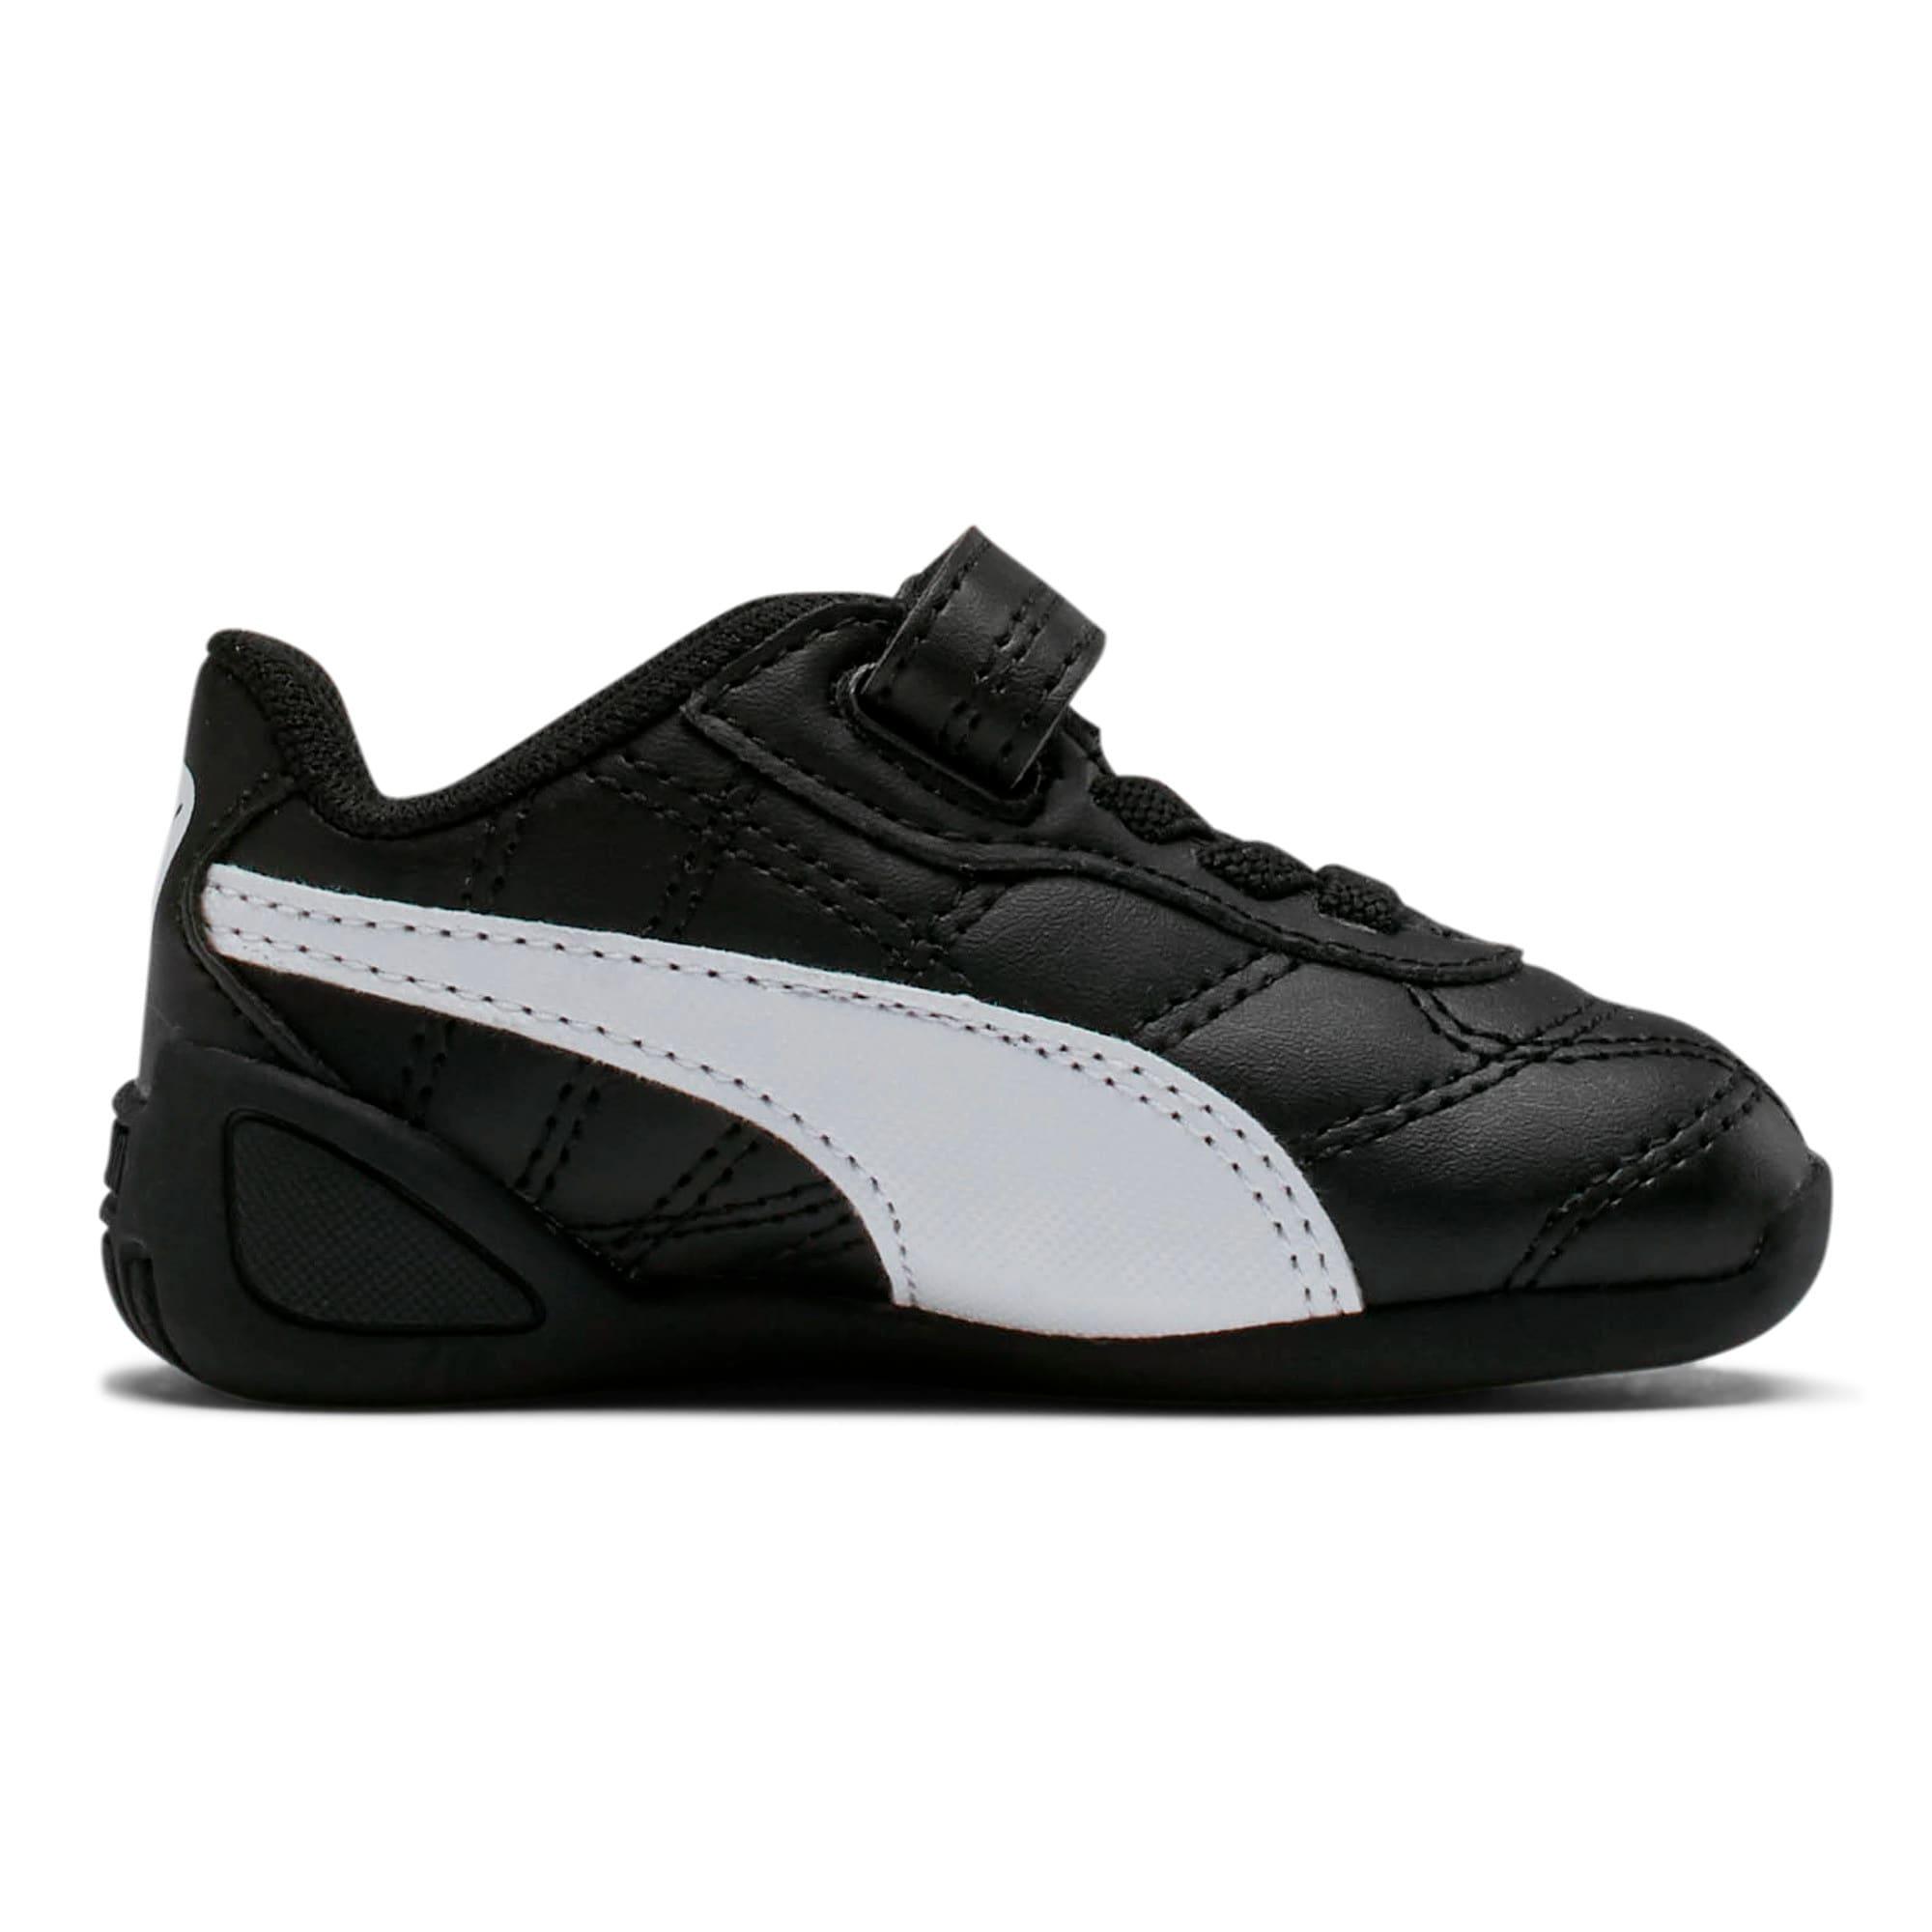 Thumbnail 5 of Tune Cat 3 AC Toddler Shoes, Puma Black-Puma White, medium